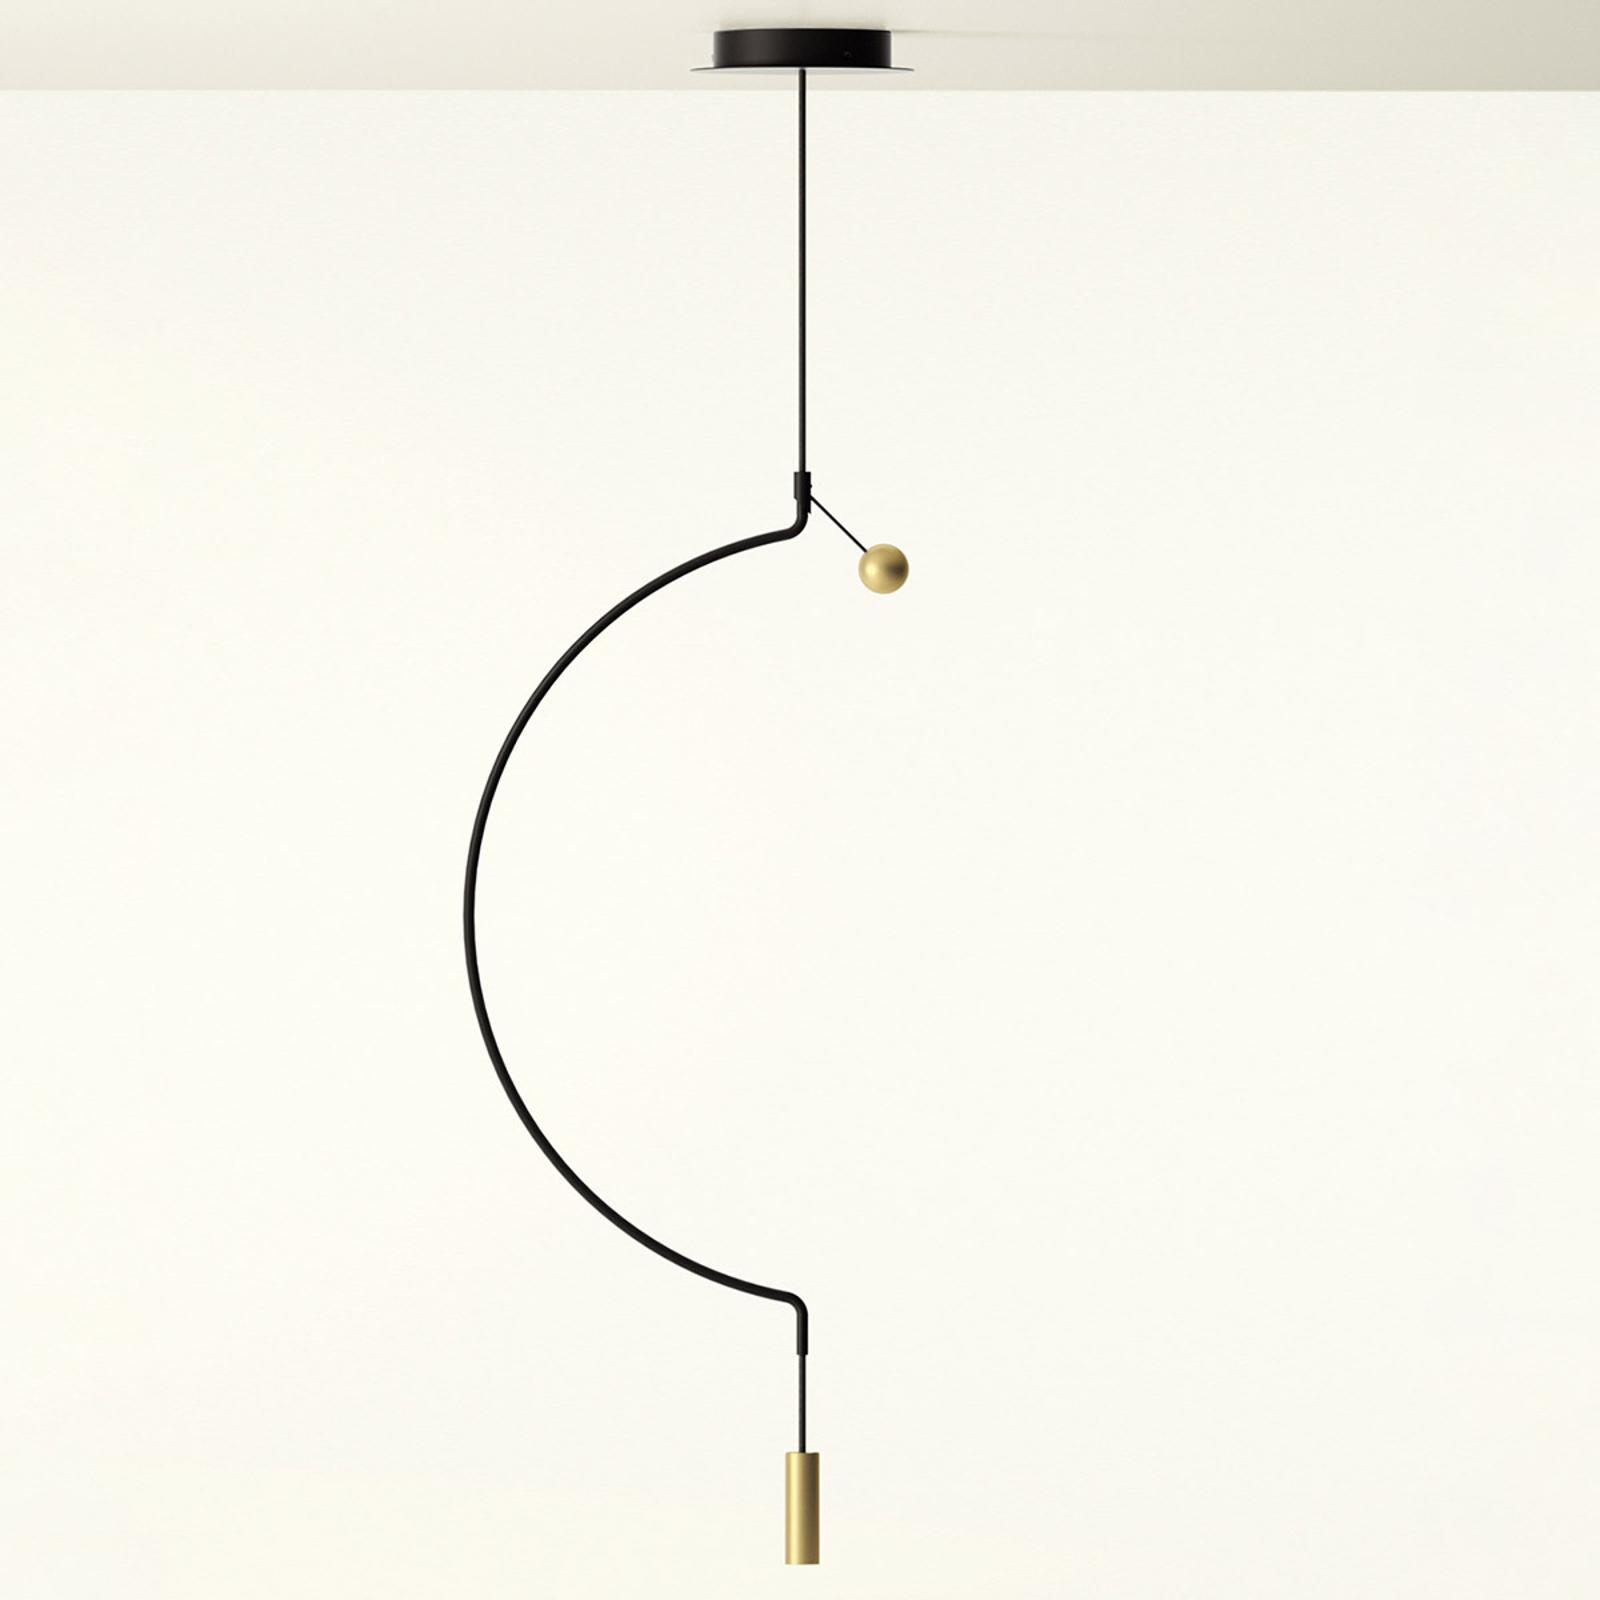 Axolight Liaison M1 Pendellampe schwarz/gold 46cm